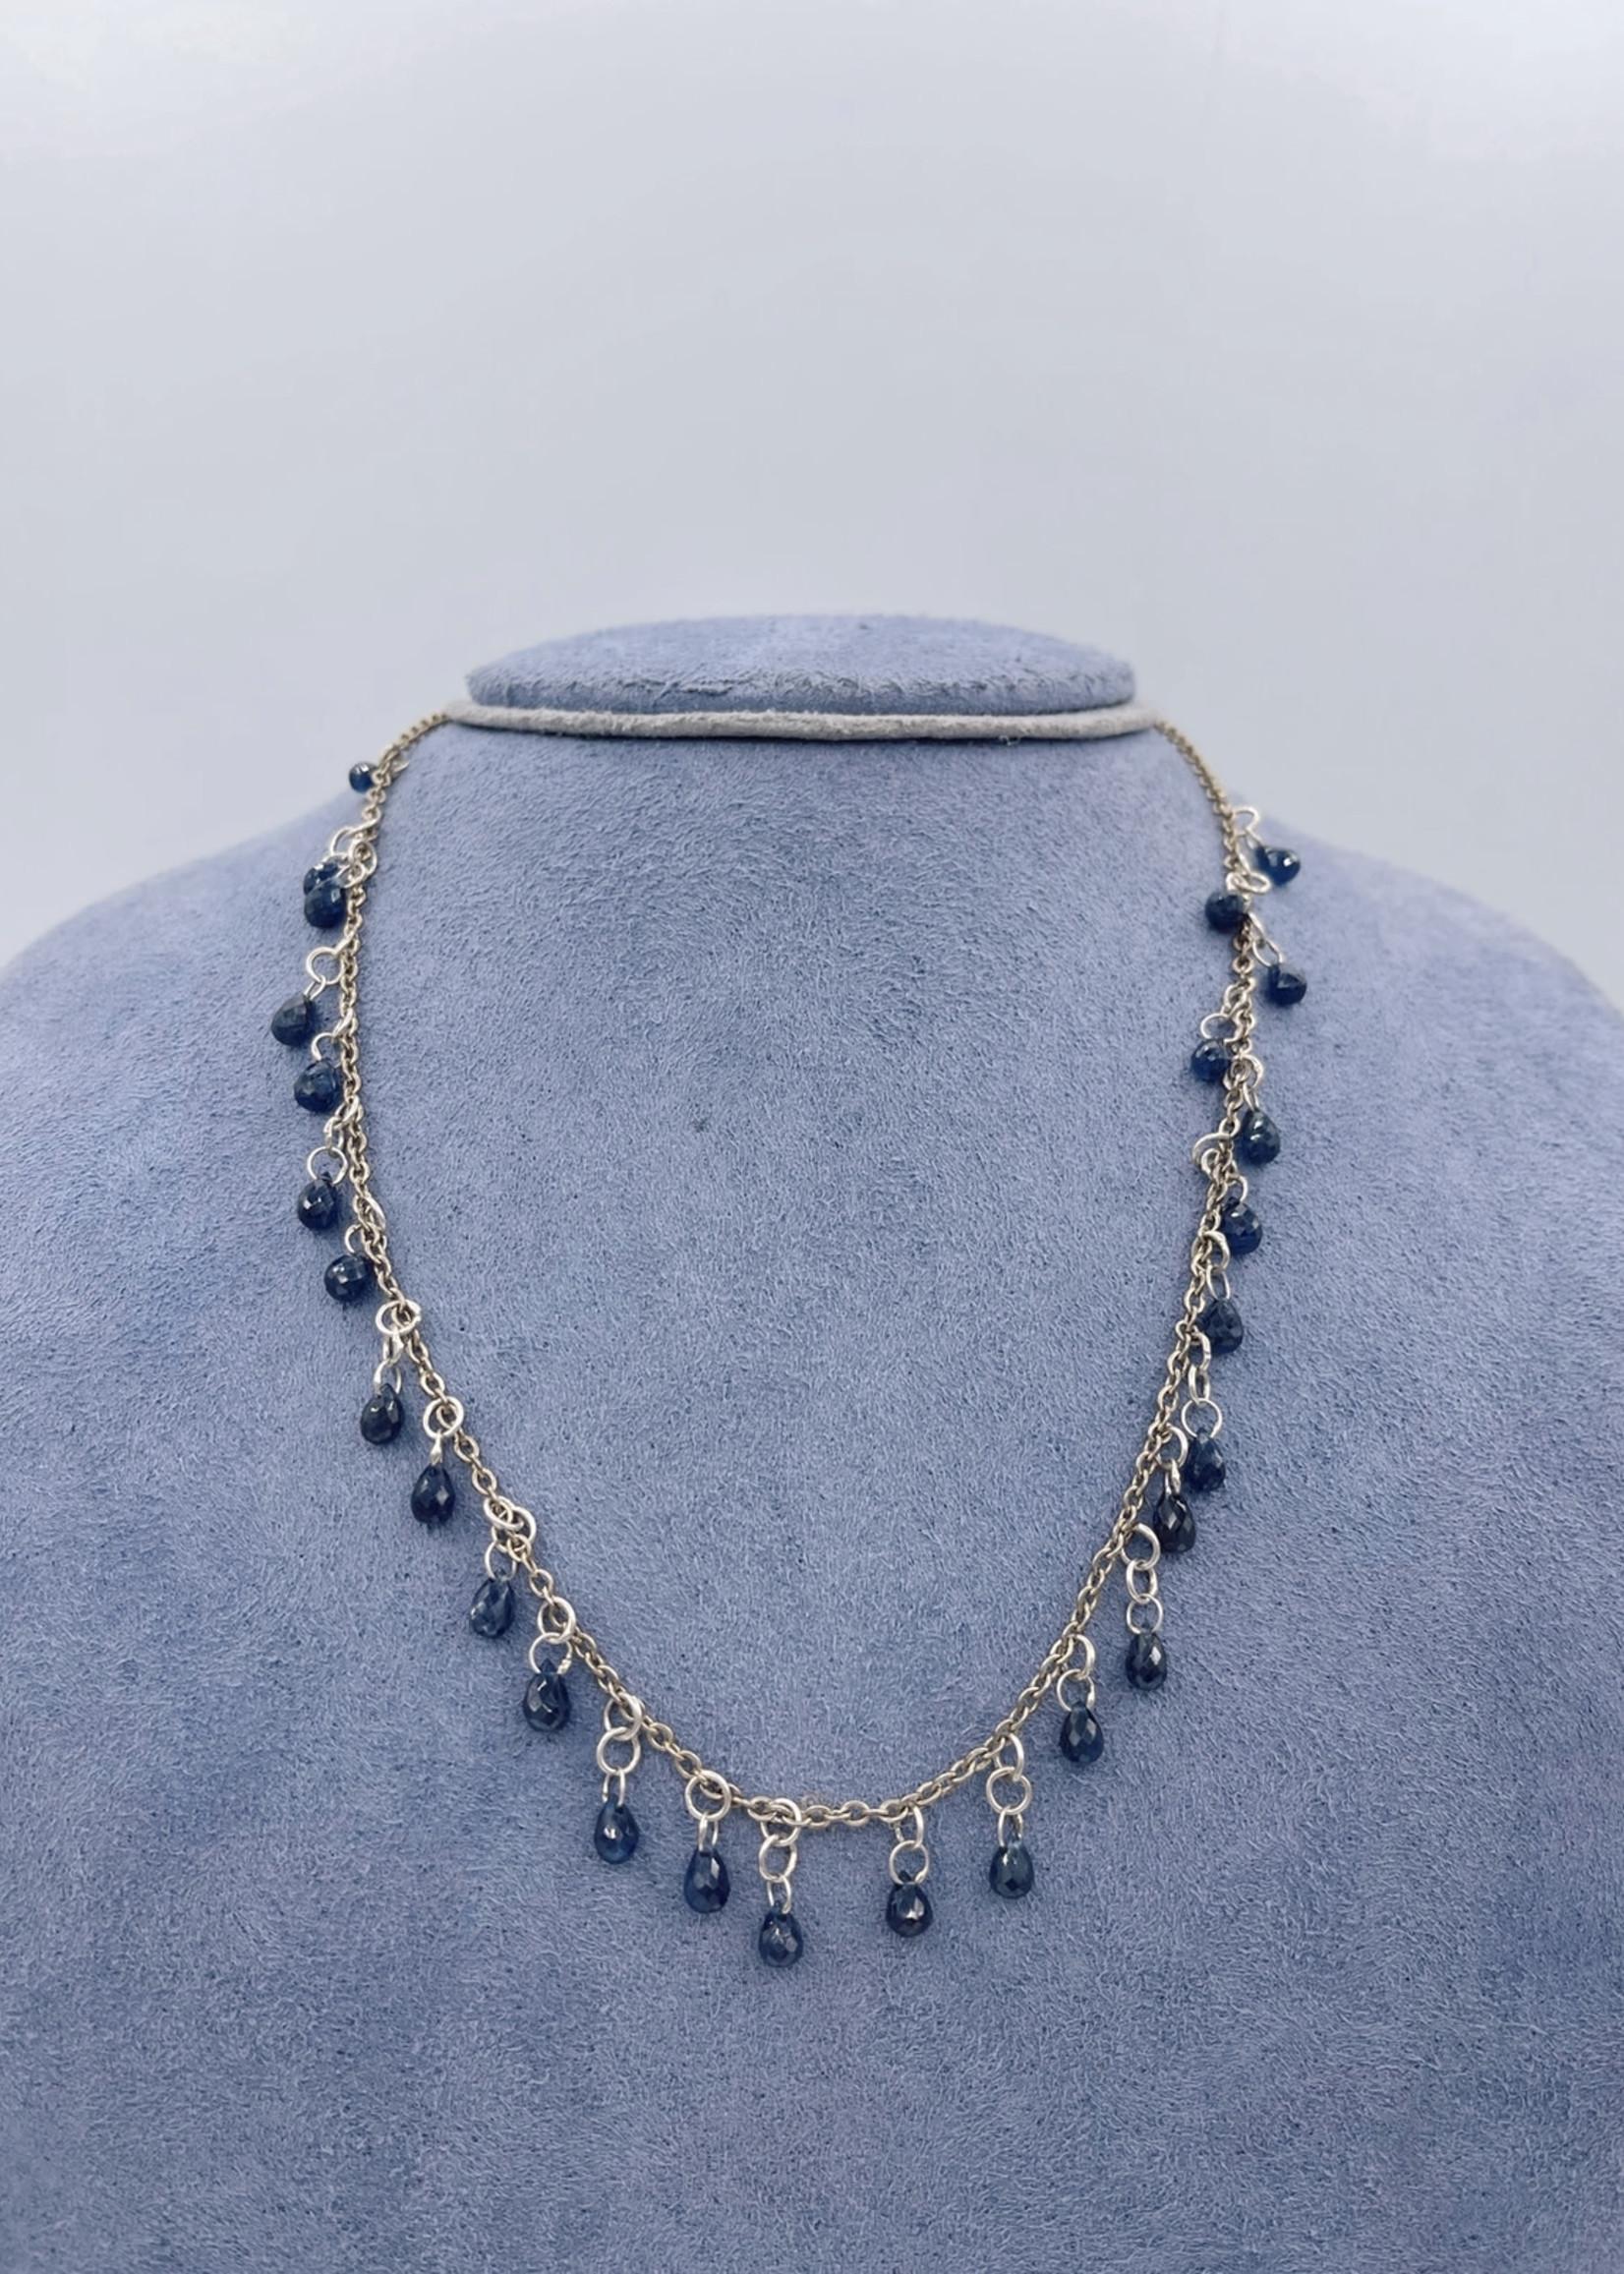 CJ Designs Blue Sapphire Necklace